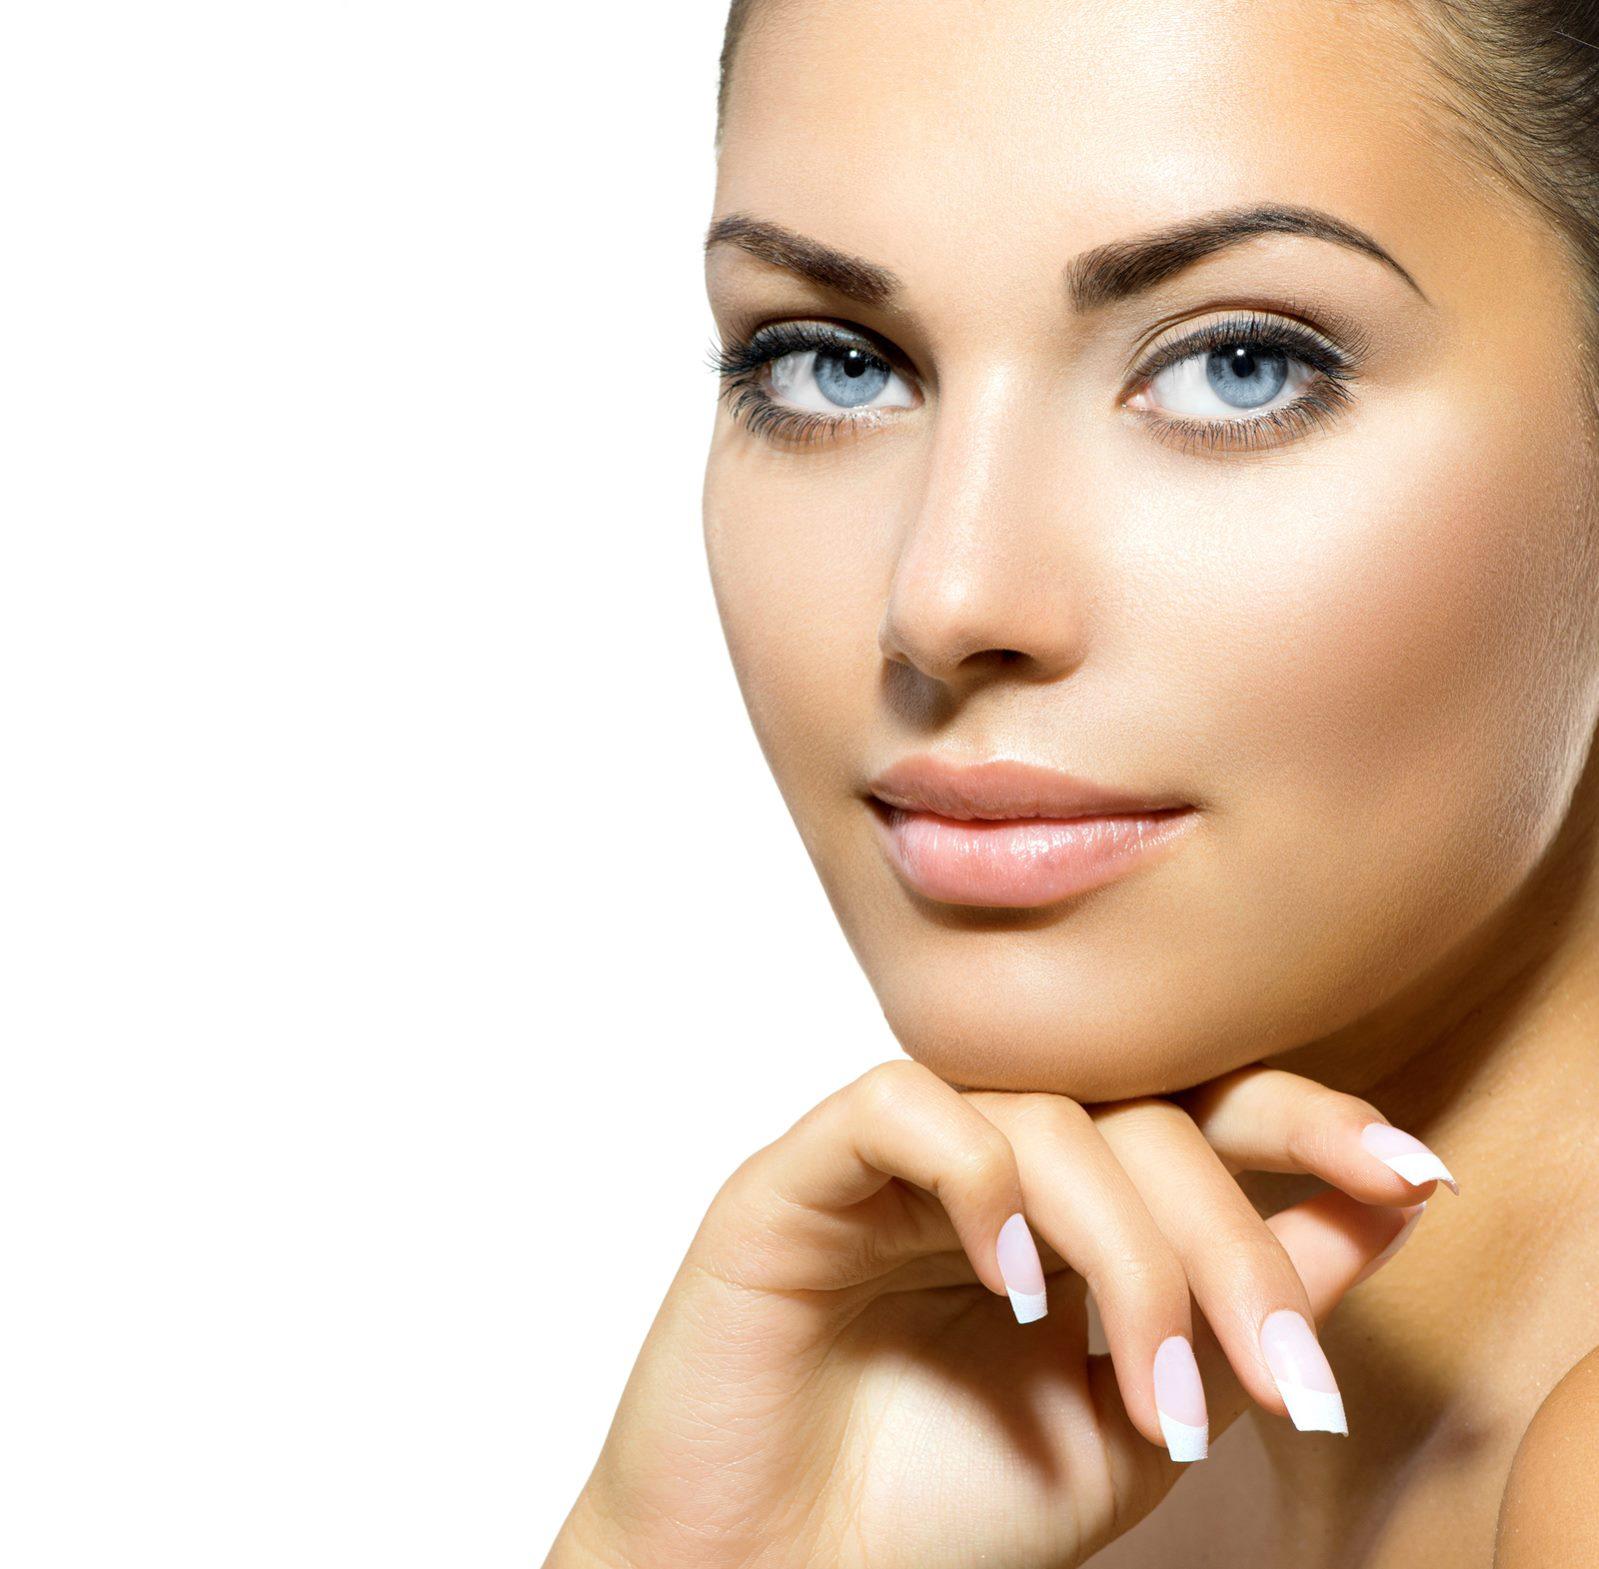 Makeup And Skin Care: Botox Cosmetic, Xeomin, Radiesse